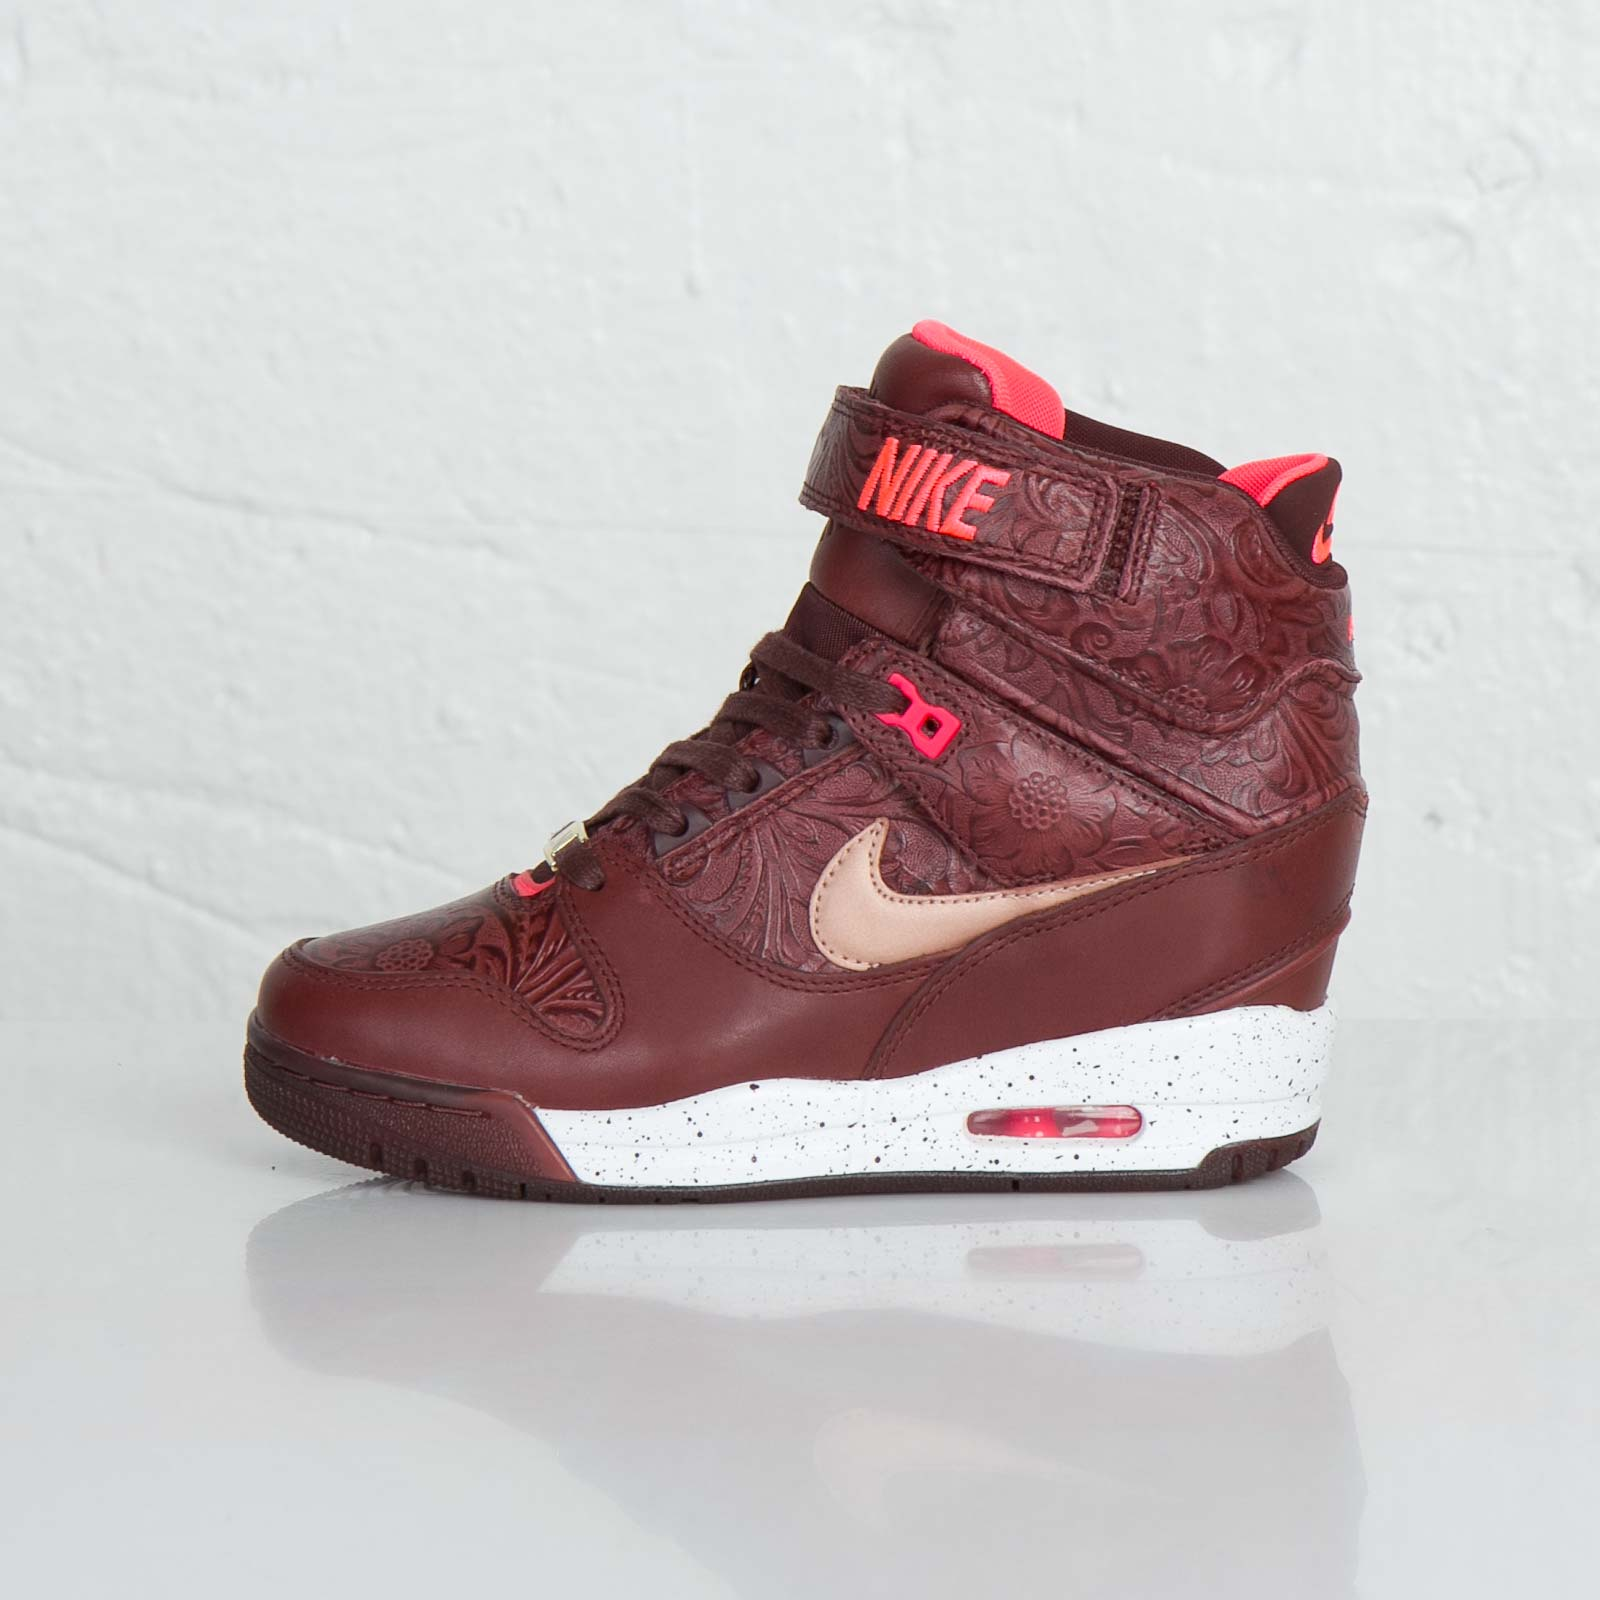 newest 0c1fc cfed1 Nike W Air Revolution Sky Hi FW QS - 633525-200 - Sneakersnstuff | sneakers  & streetwear online since 1999